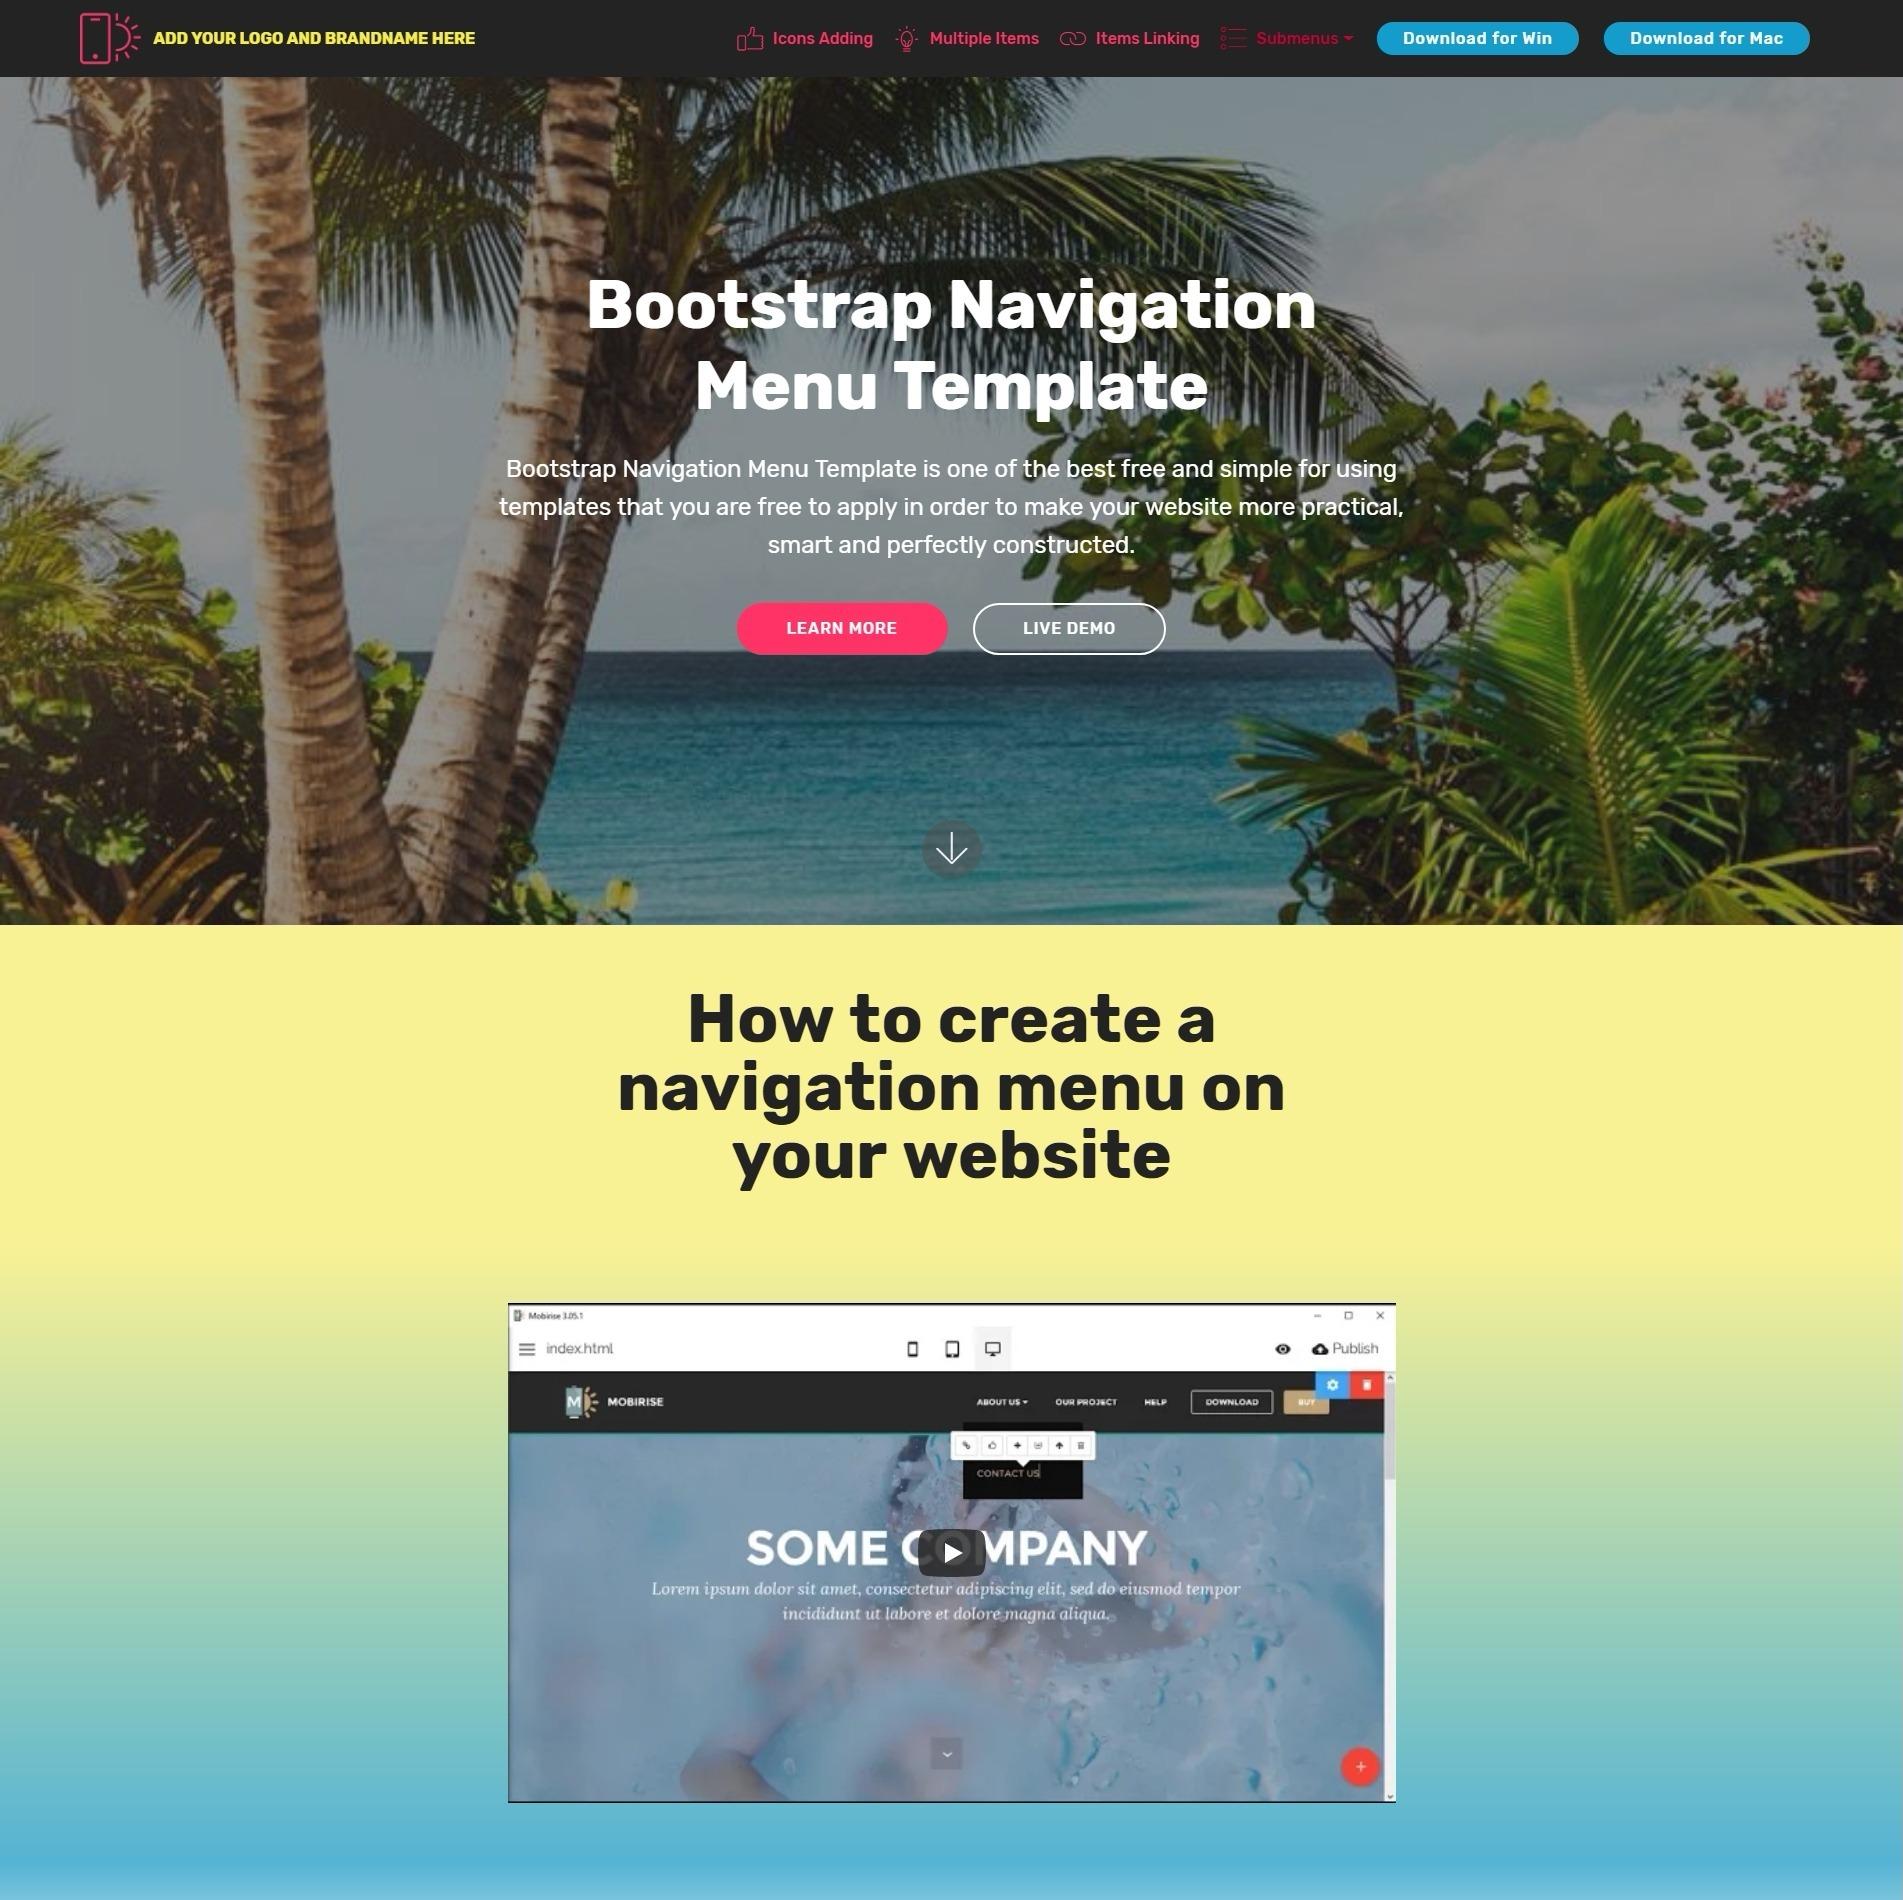 Bootstrap Navigation Menu Template